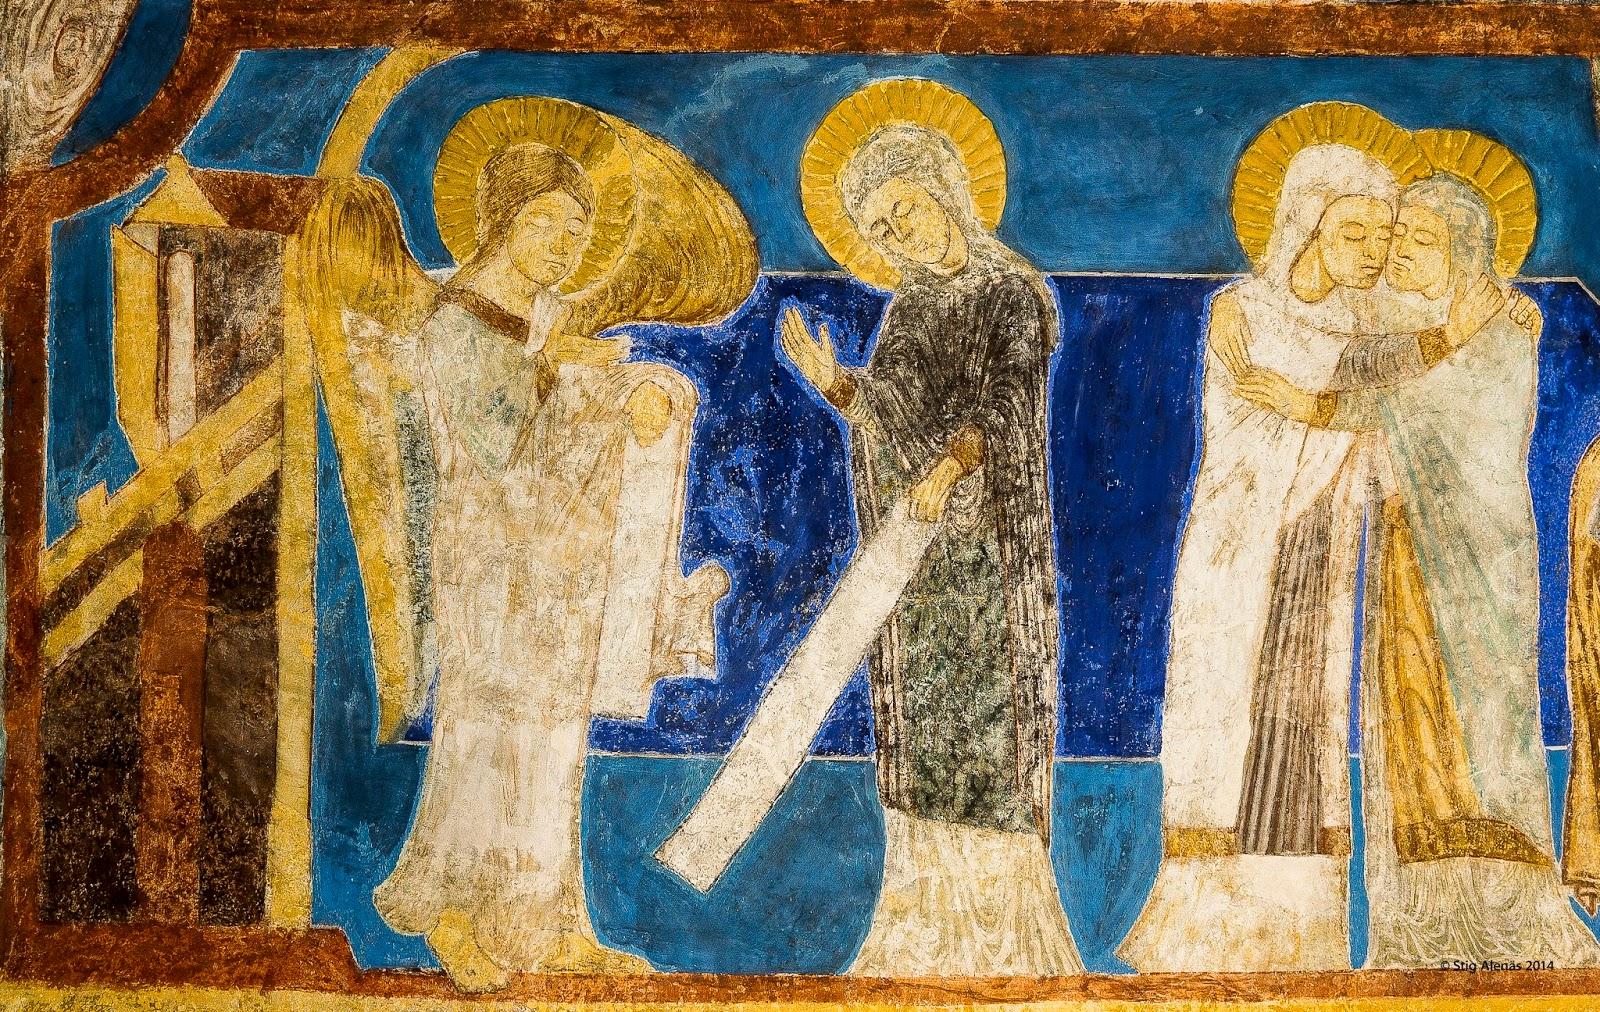 medieval, archangel, annunciation, mural, incarnation, virgin, saint, gabriel, angel, paint, editorial, sweden, church, bible, christ, ultramarine, fresco, holy, religion, byzantine, elizabeth, visitation, christianity, mary, romanesque, bjaresjo, https://www.shutterstock.com/image-photo/annunciation-angel-gabriel-tells-mary-that-531577648